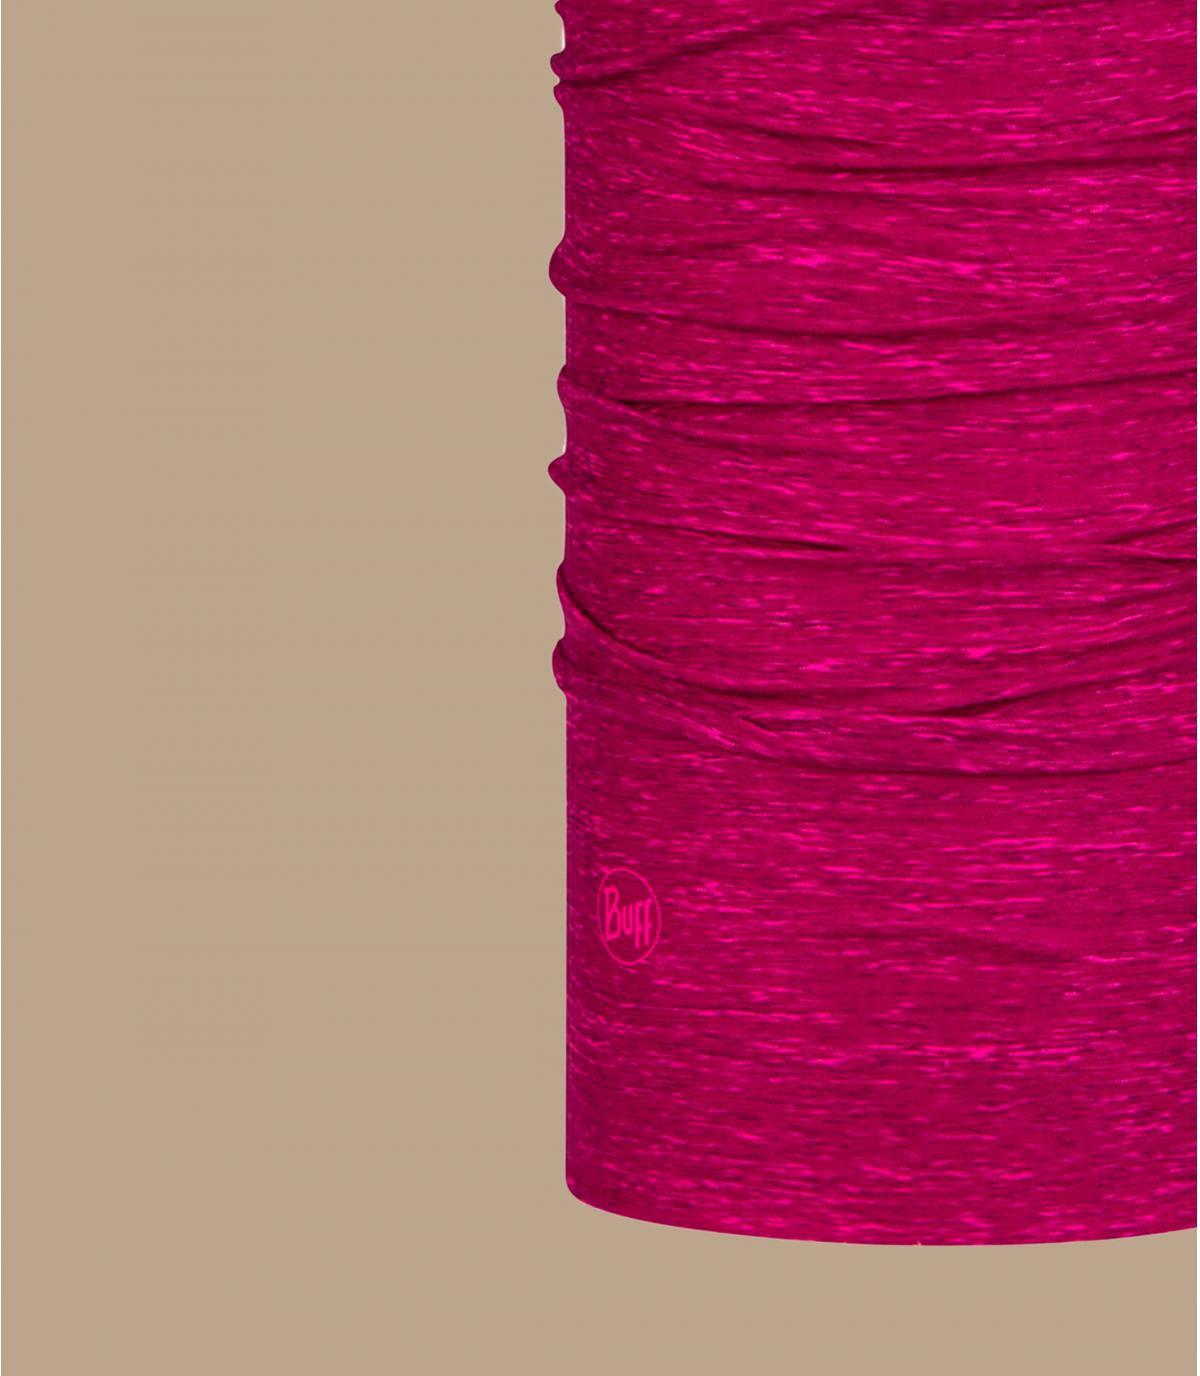 Détails Filter Tube pump pink - image 3